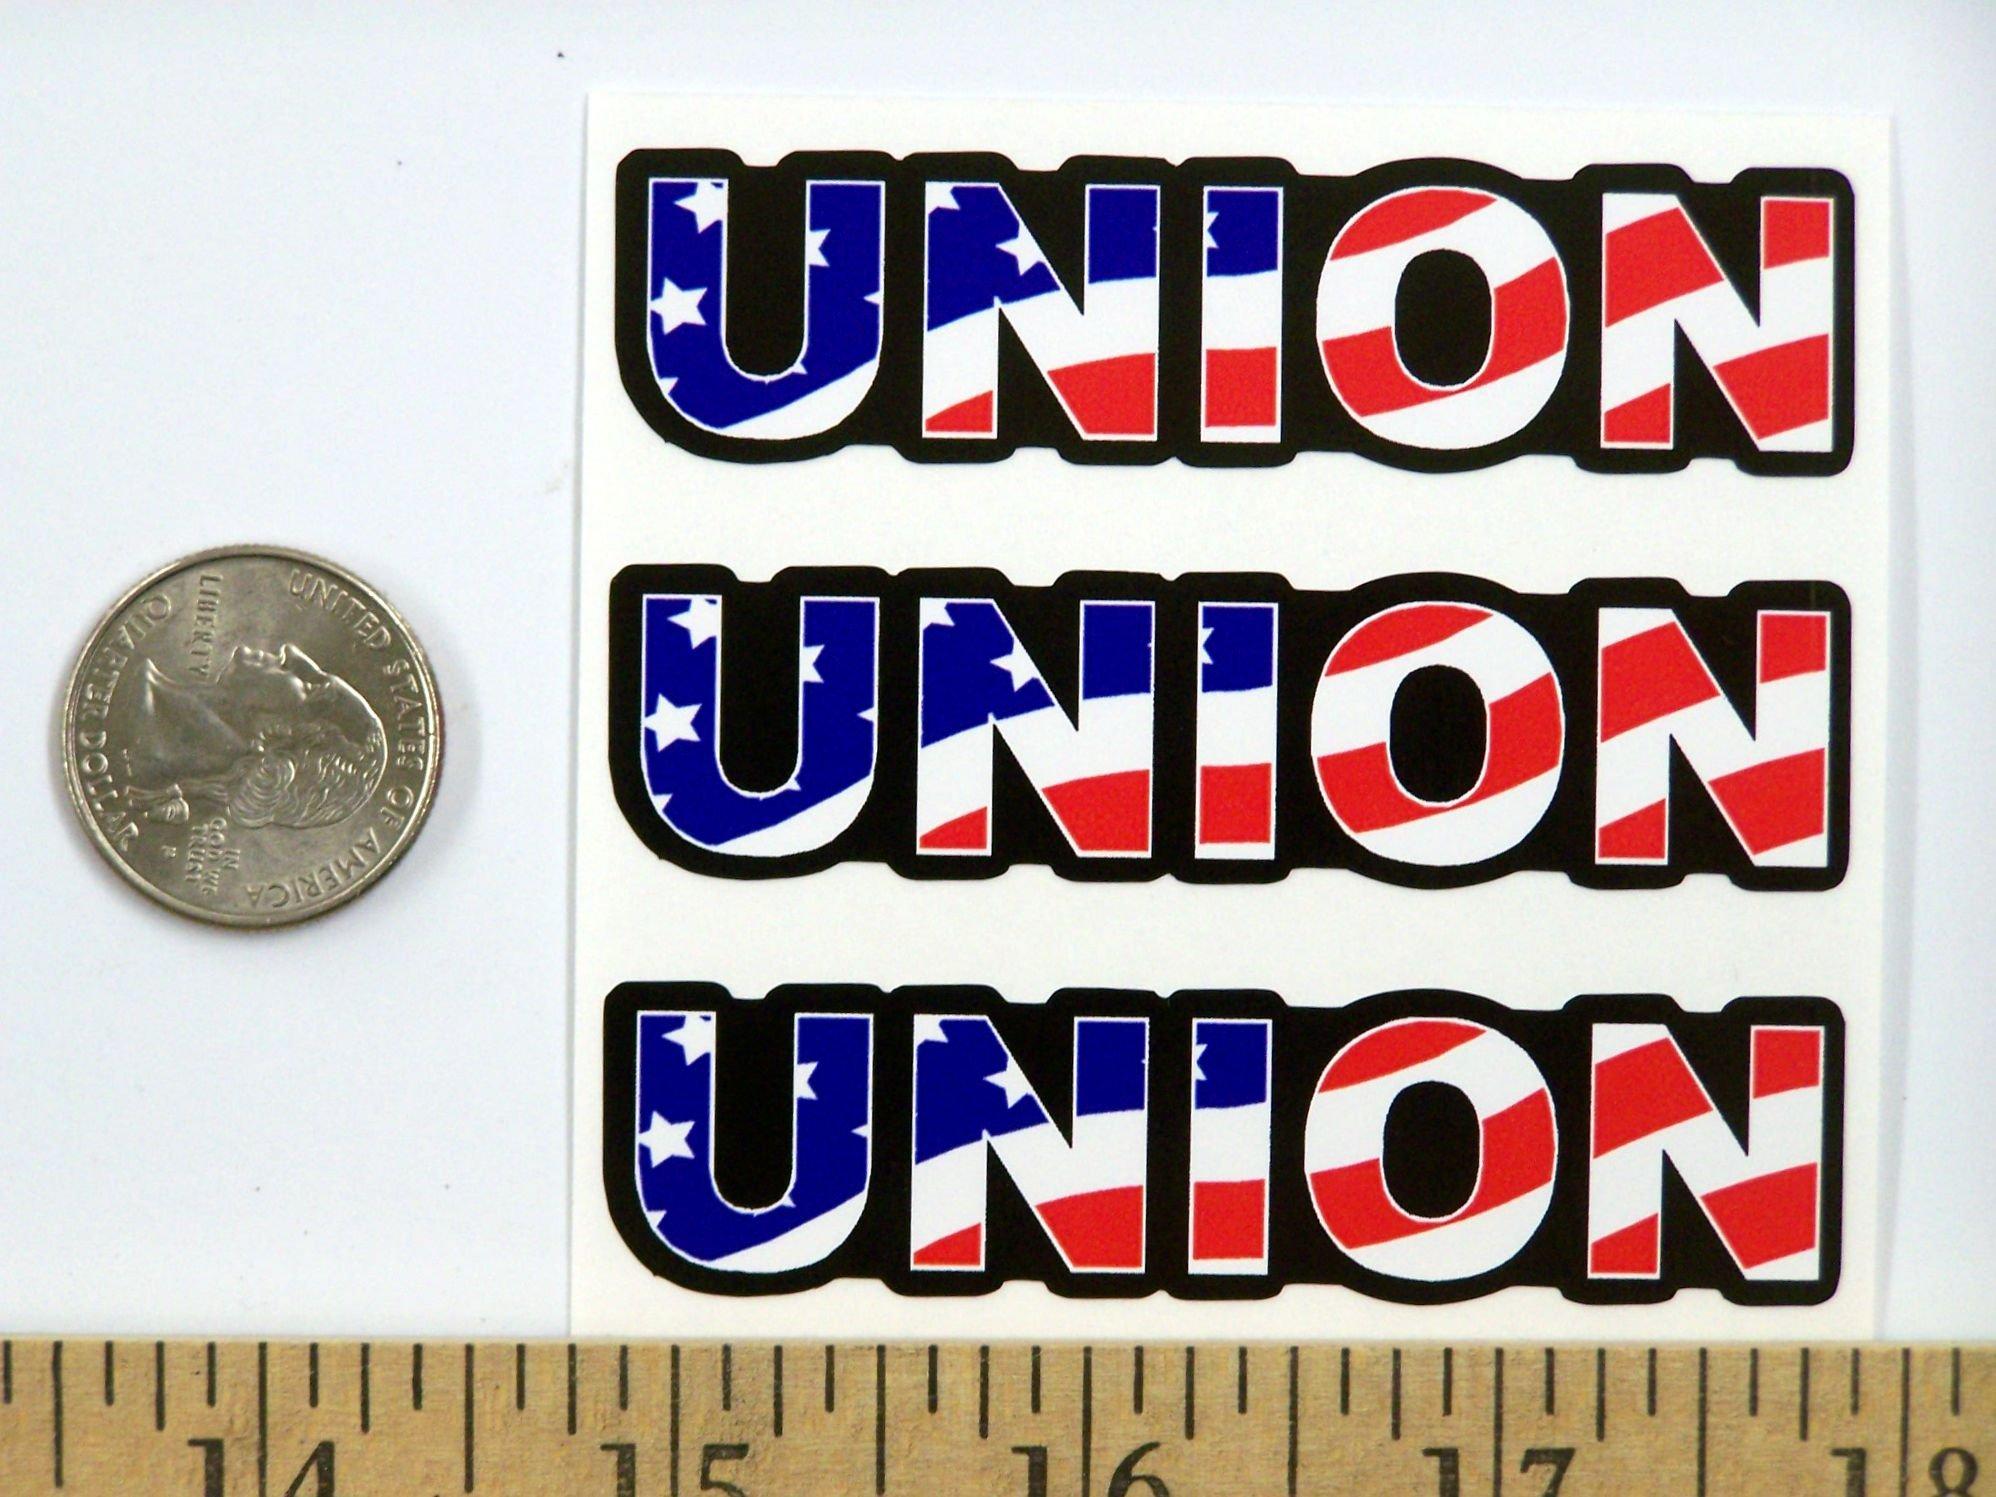 "3 - Union US Flag Hard Hat/Helmet Stickers 1"" x 2"" H156 by StickerPirate (Image #2)"